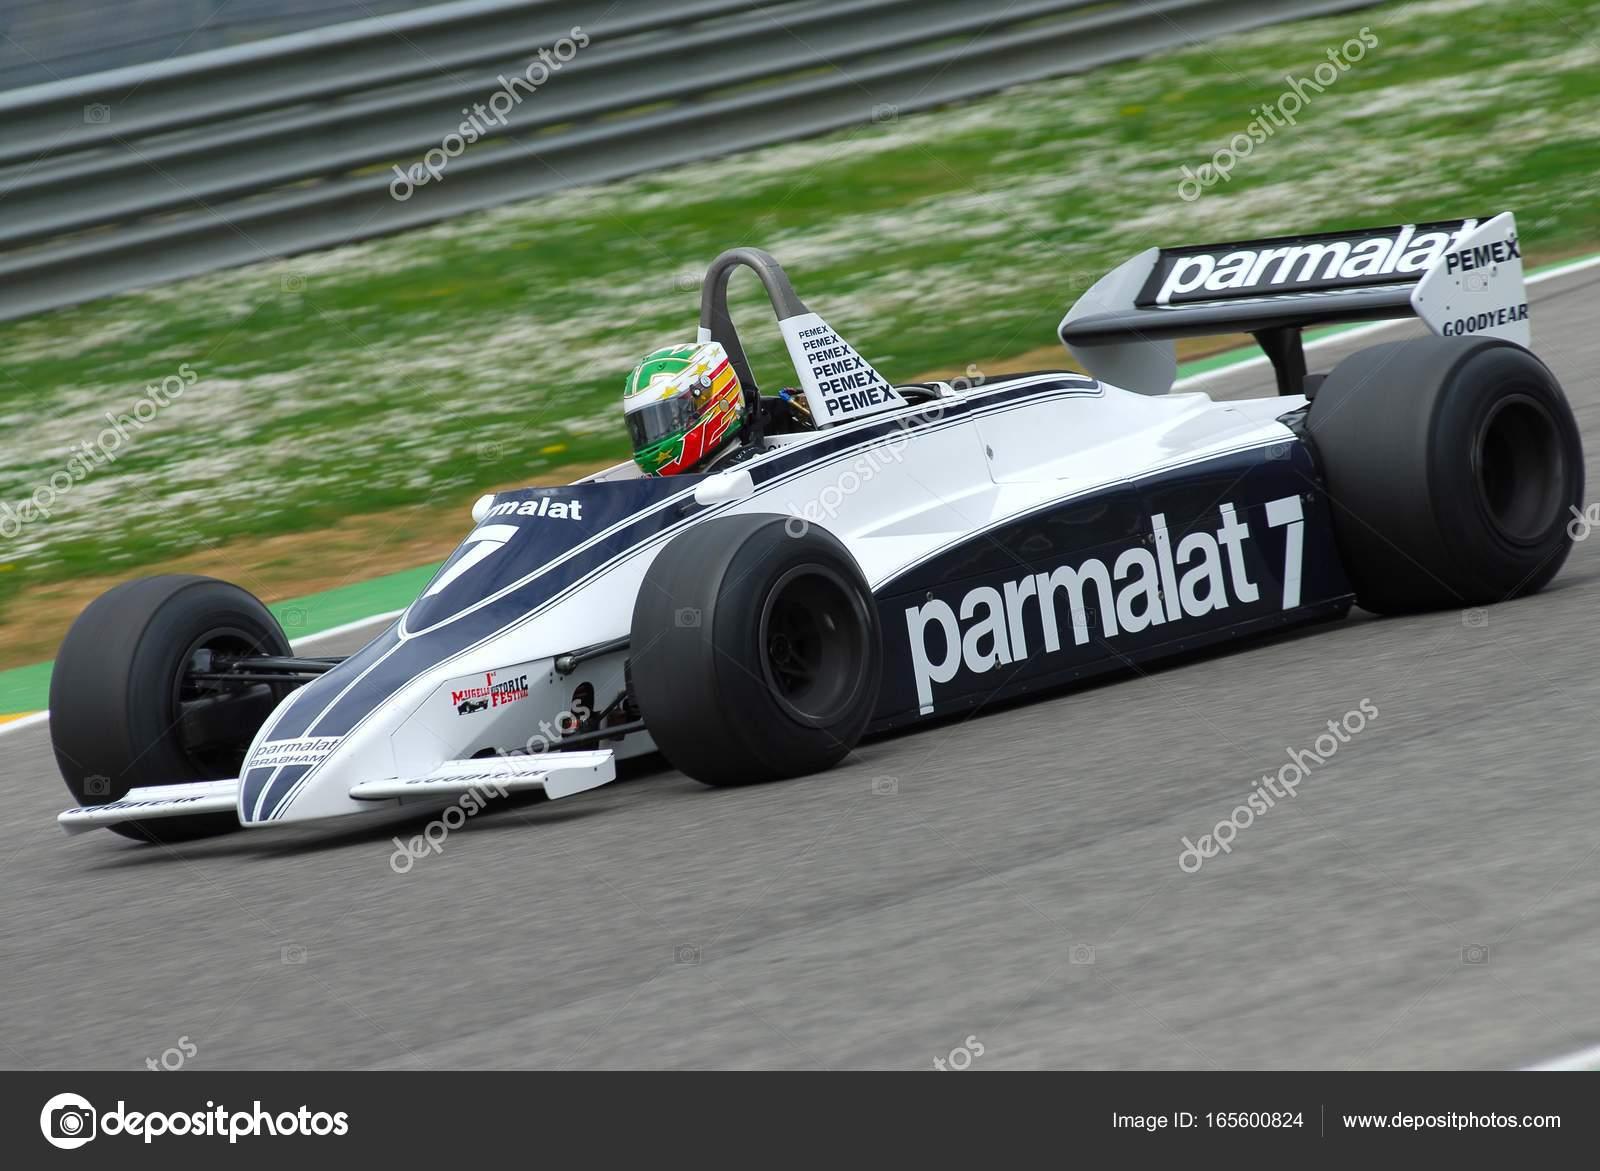 Mugello Circuit 1 April 2007: Unknown run on Classic F1 Car 1980 ...